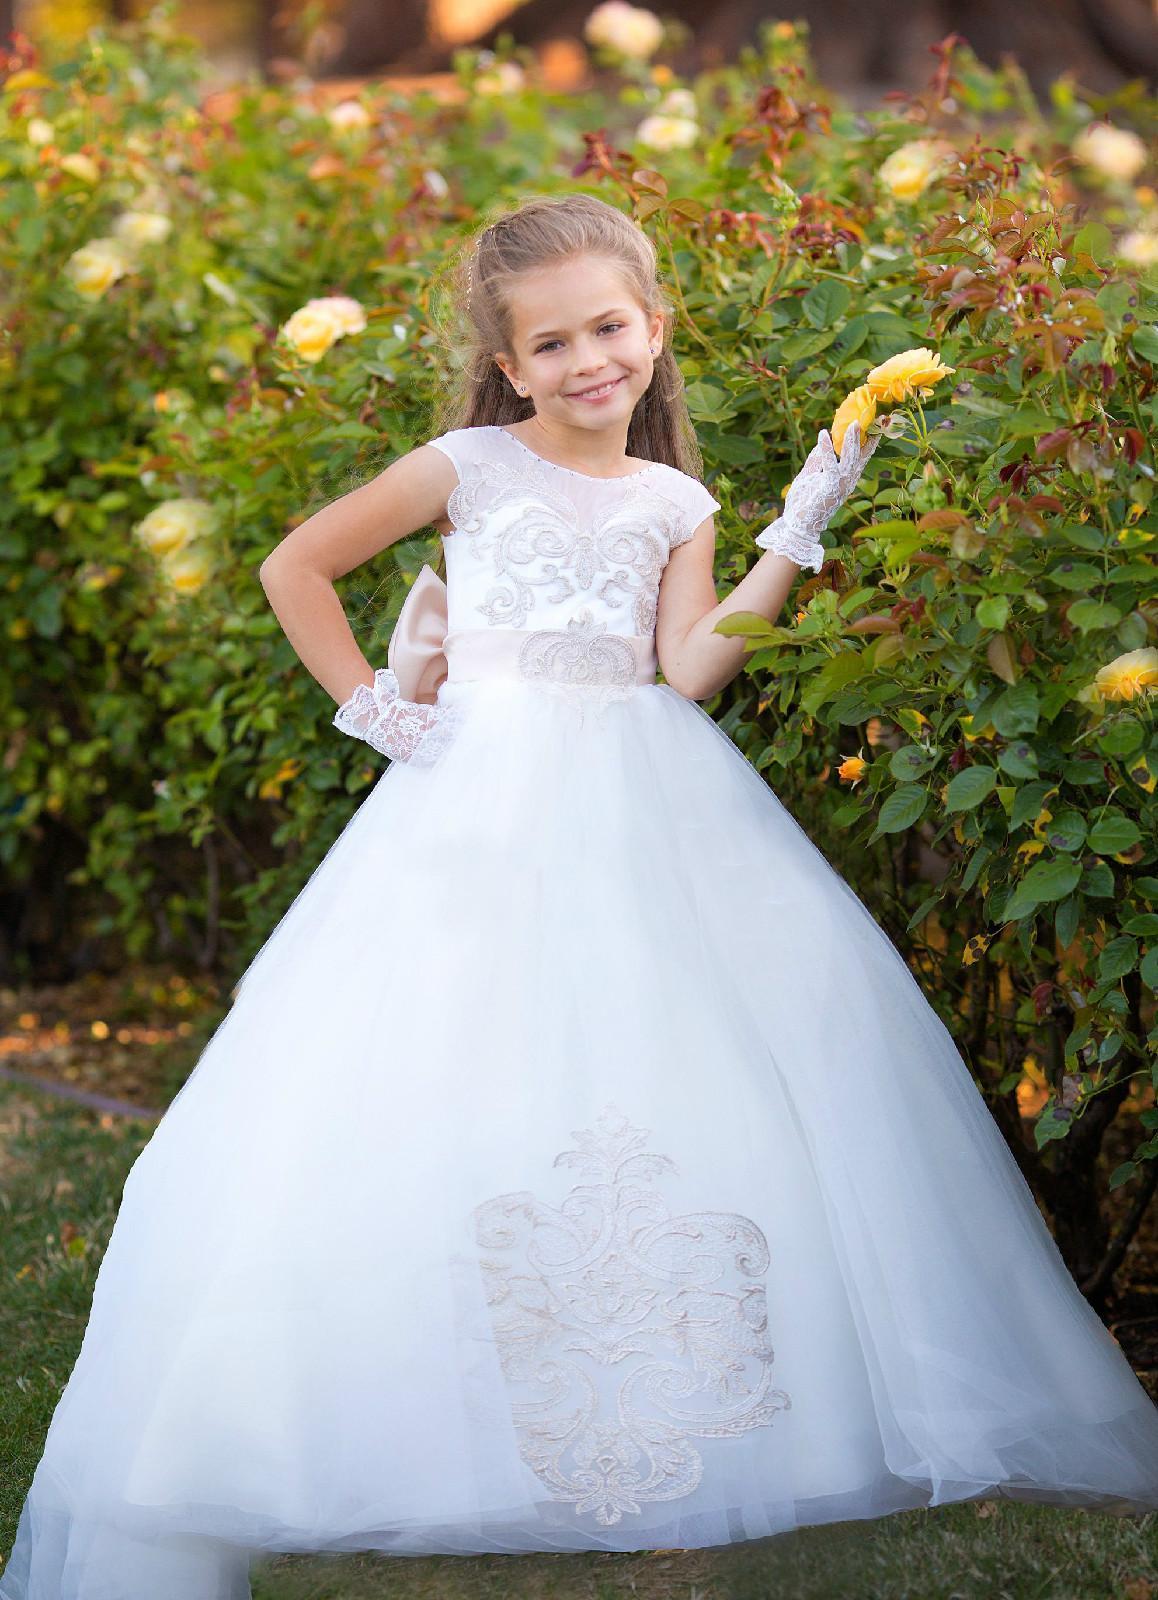 bb78bab190d White Ivory Flower Girl Dress Lace Little Kids Clothing Princess Christmas  Tutu Dress Toddler Special Wedding Formal Occasion Custom Black And White  Flower ...